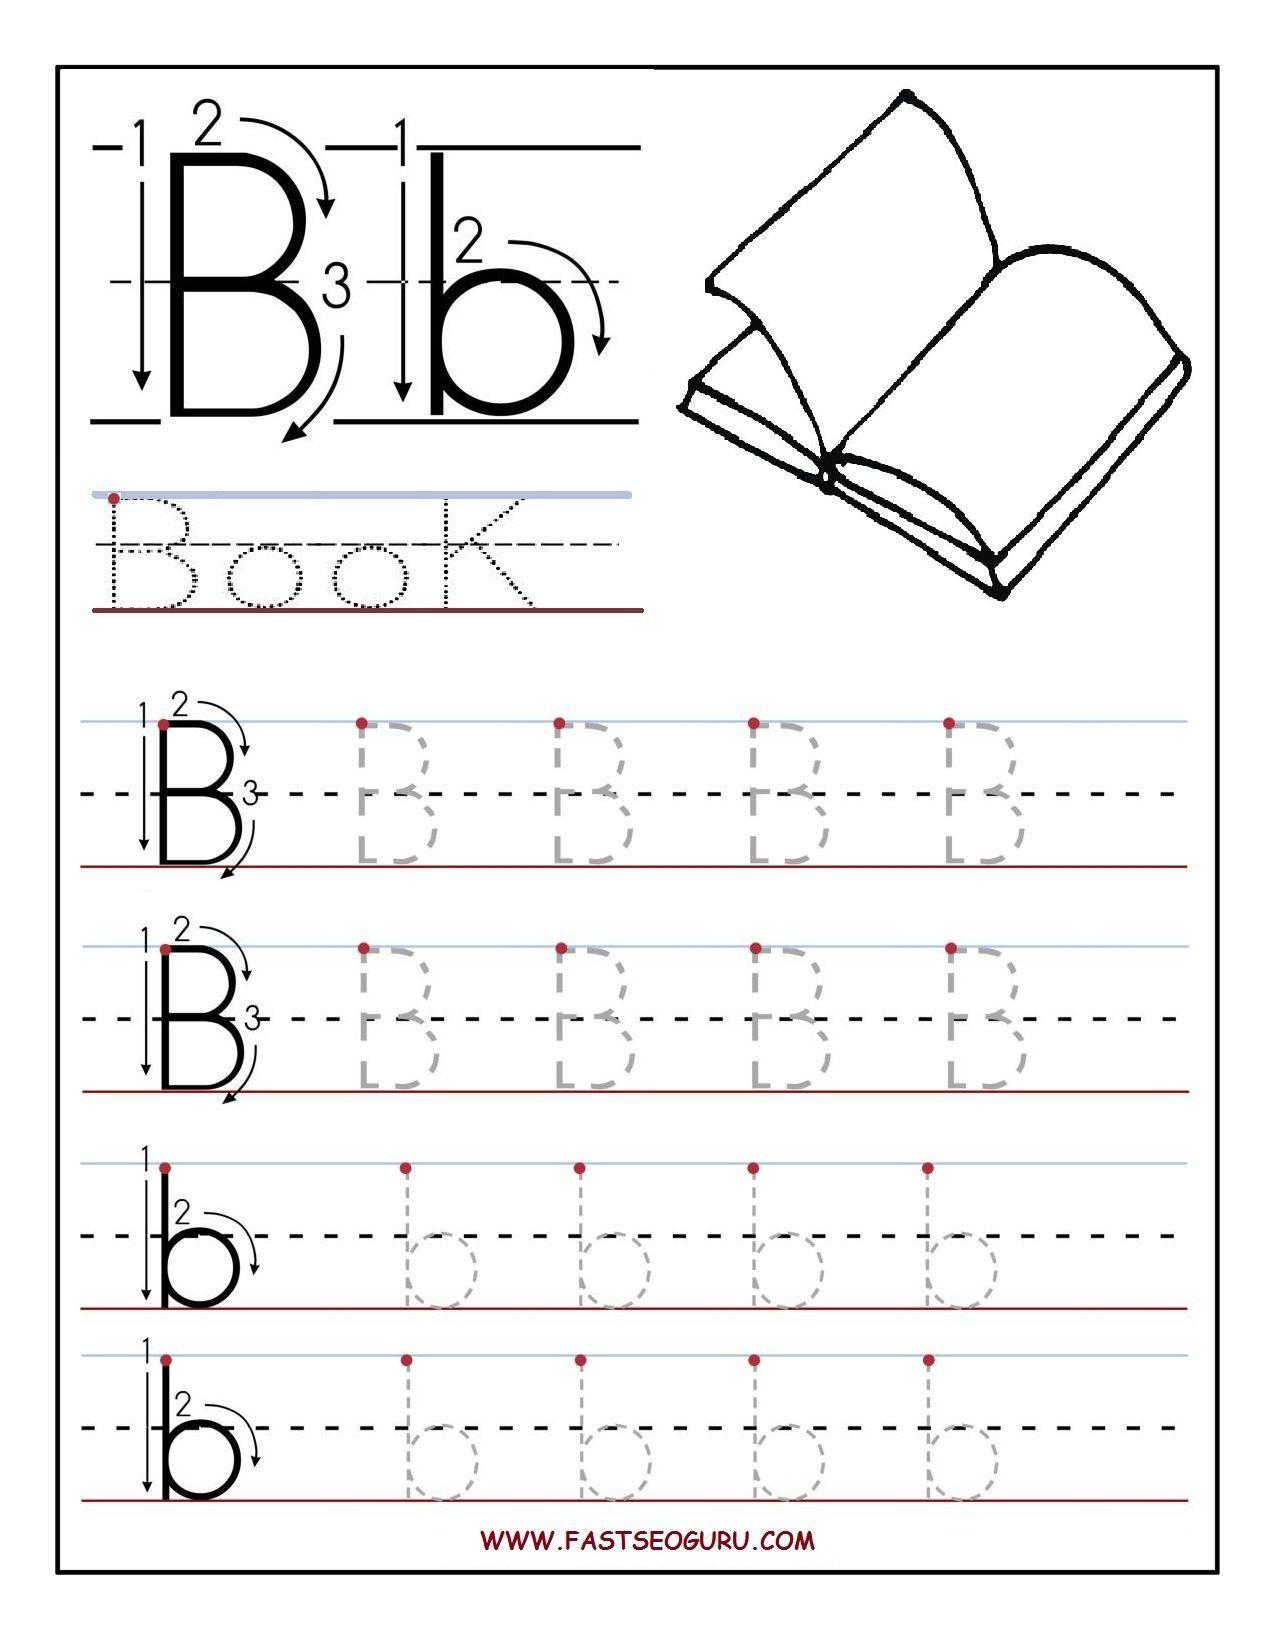 Letter B Worksheets For Preschoolers Printable Letter B Letter